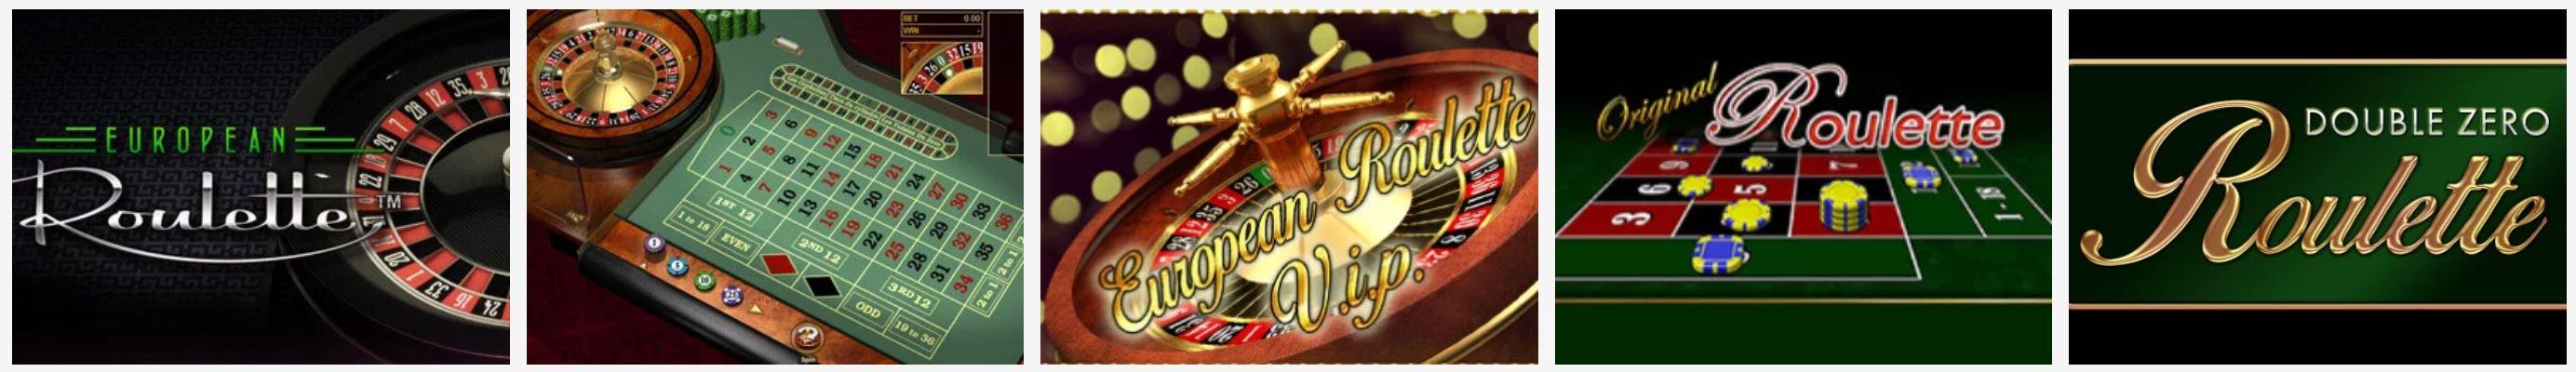 wunderino-roulette